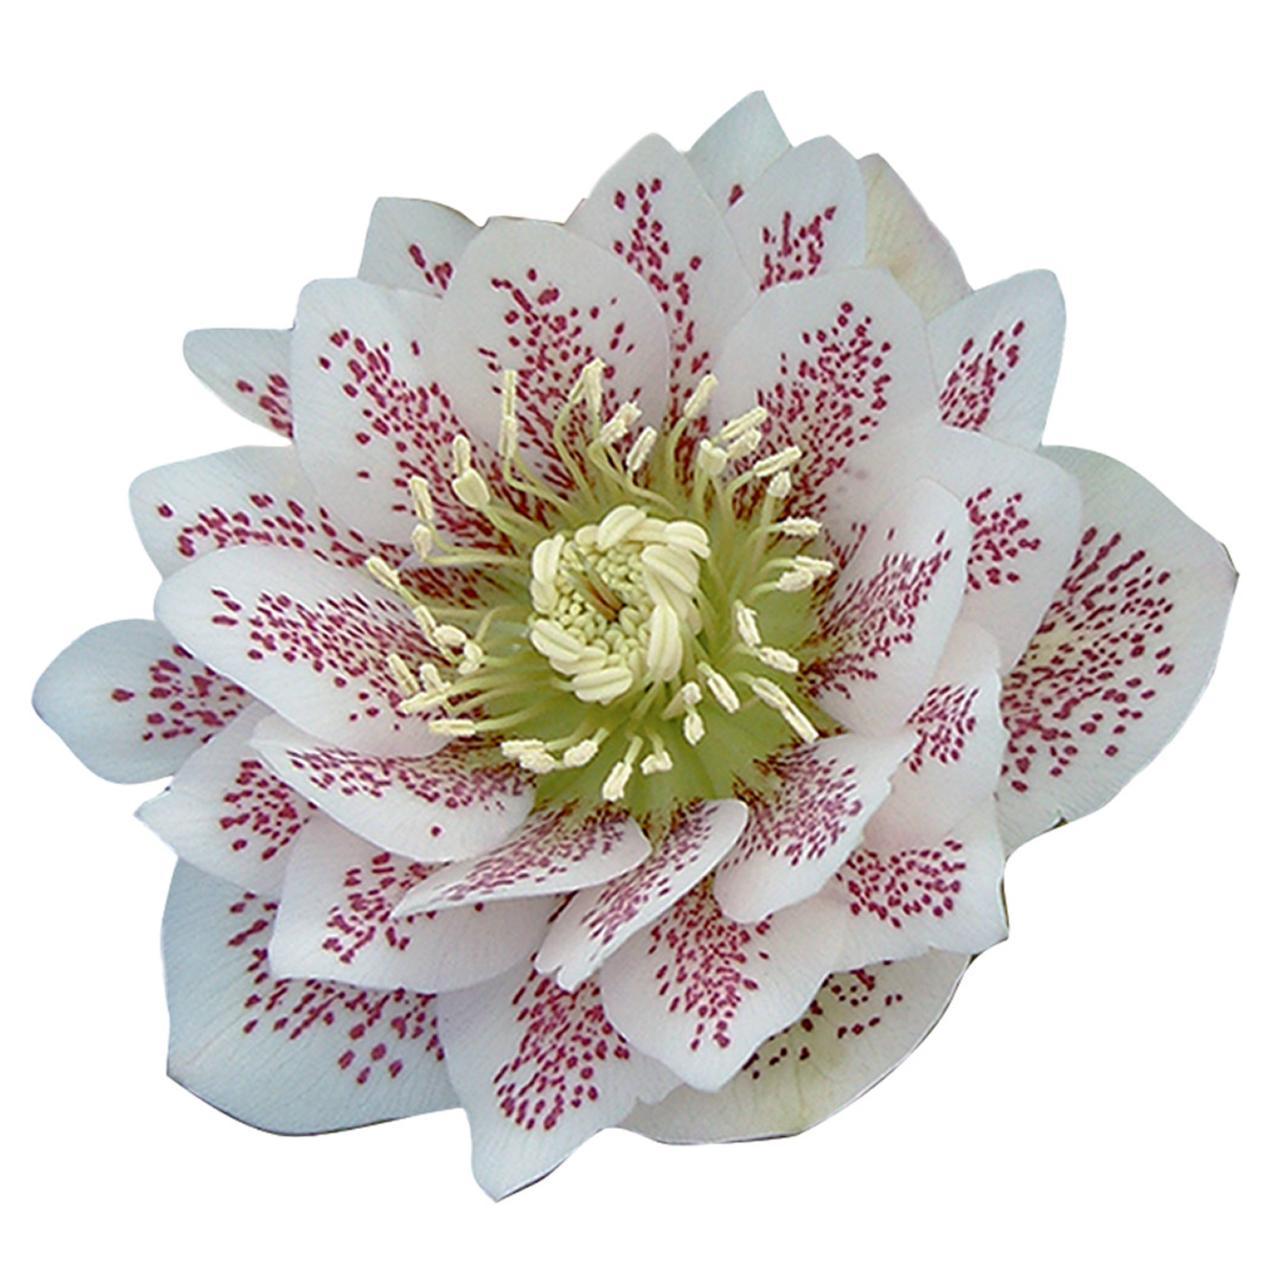 Helleborus orientalis 'Cinderella' plant